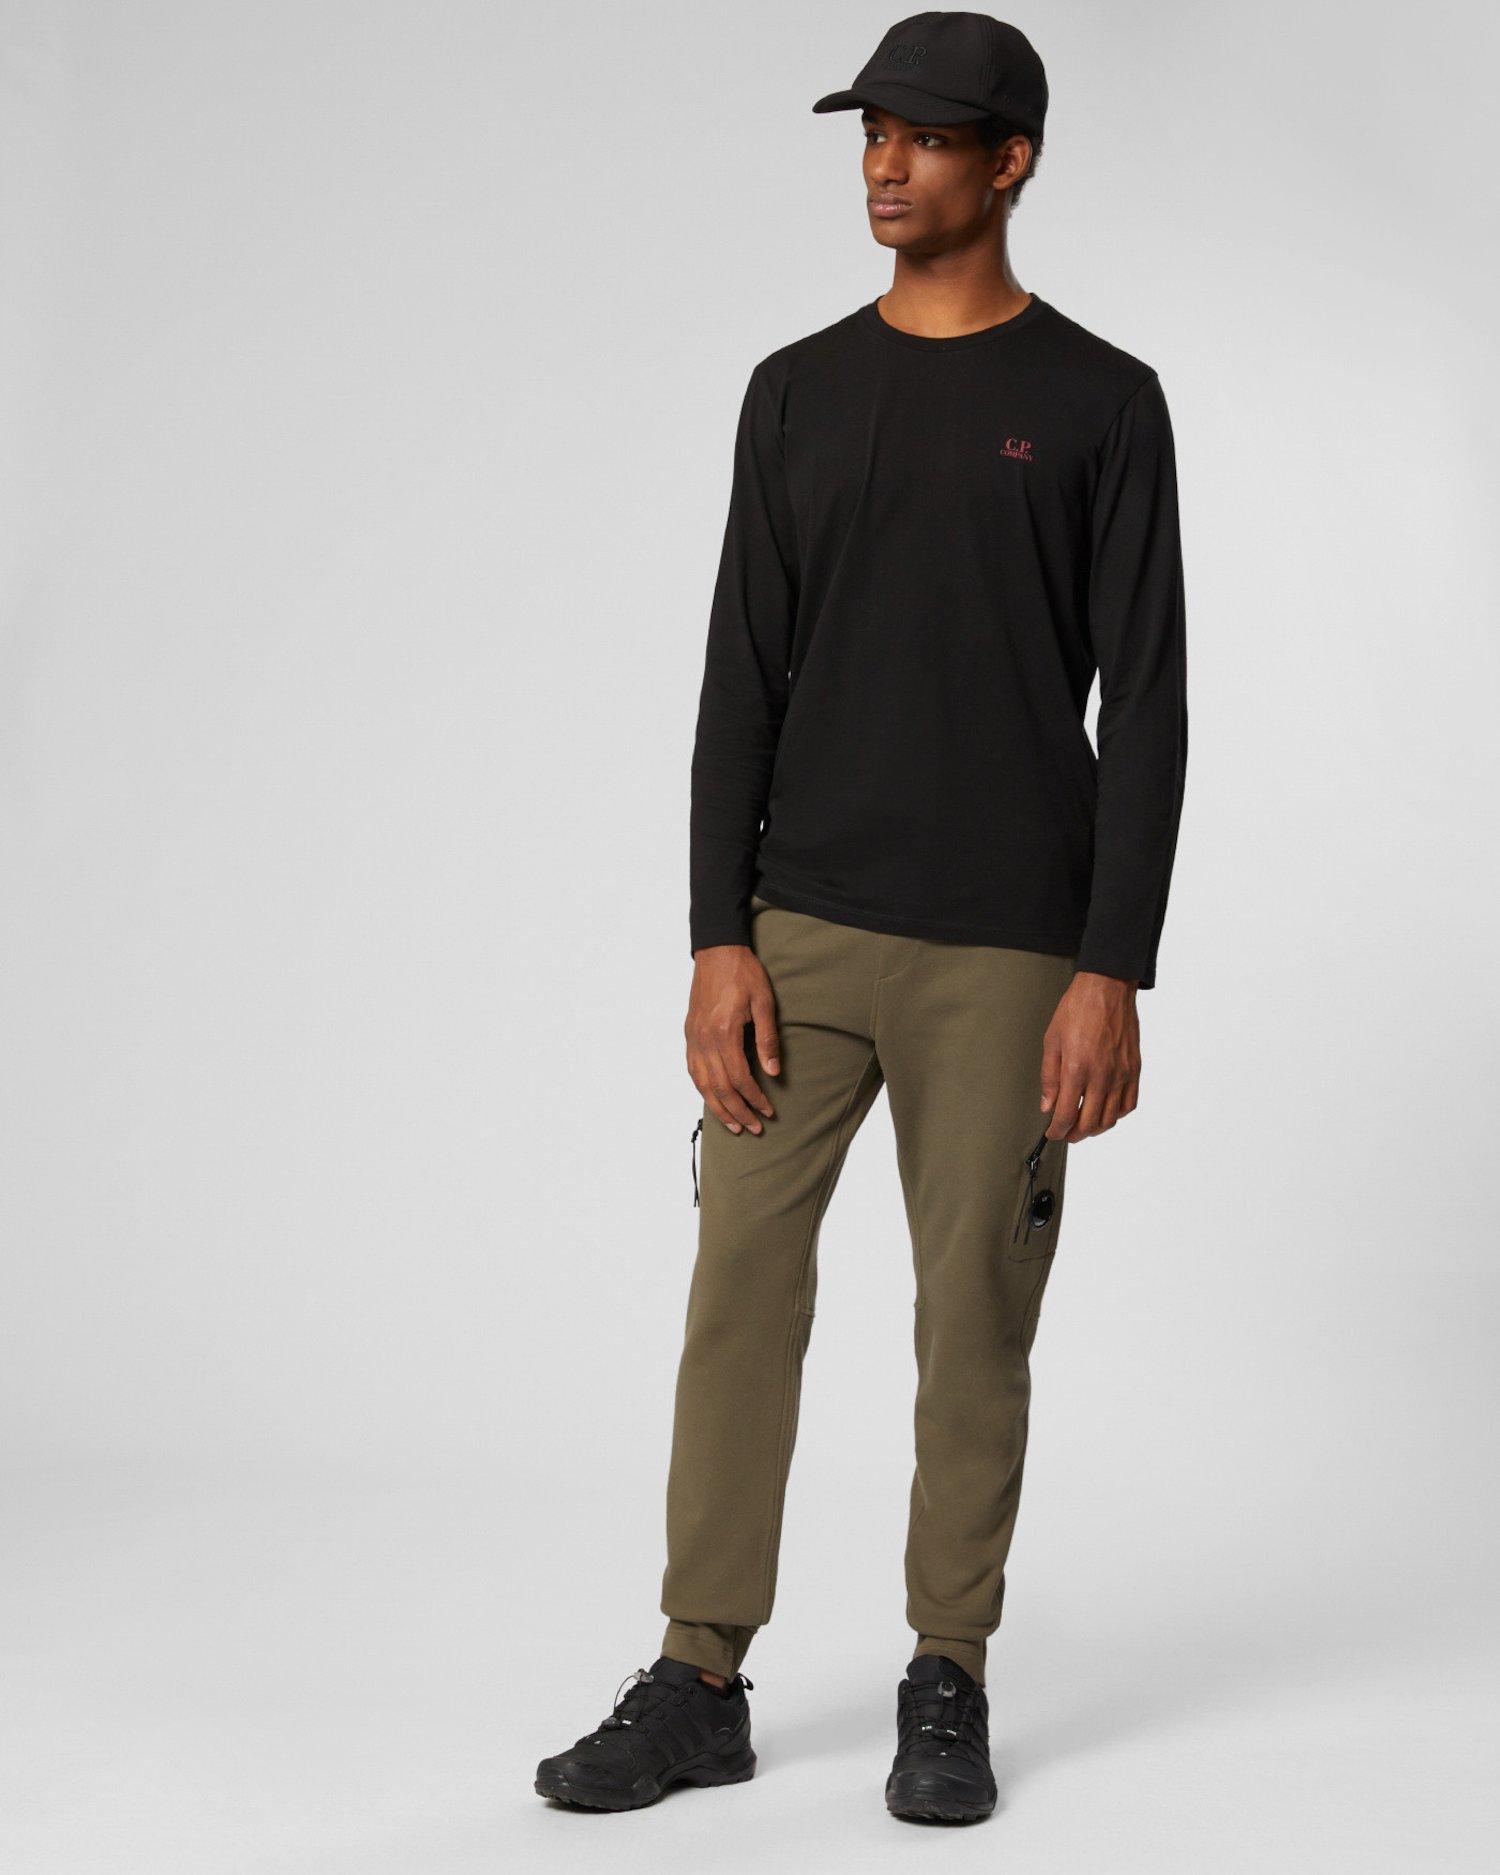 Diagonal Raised Fleece Zip Pocket Sweatpants